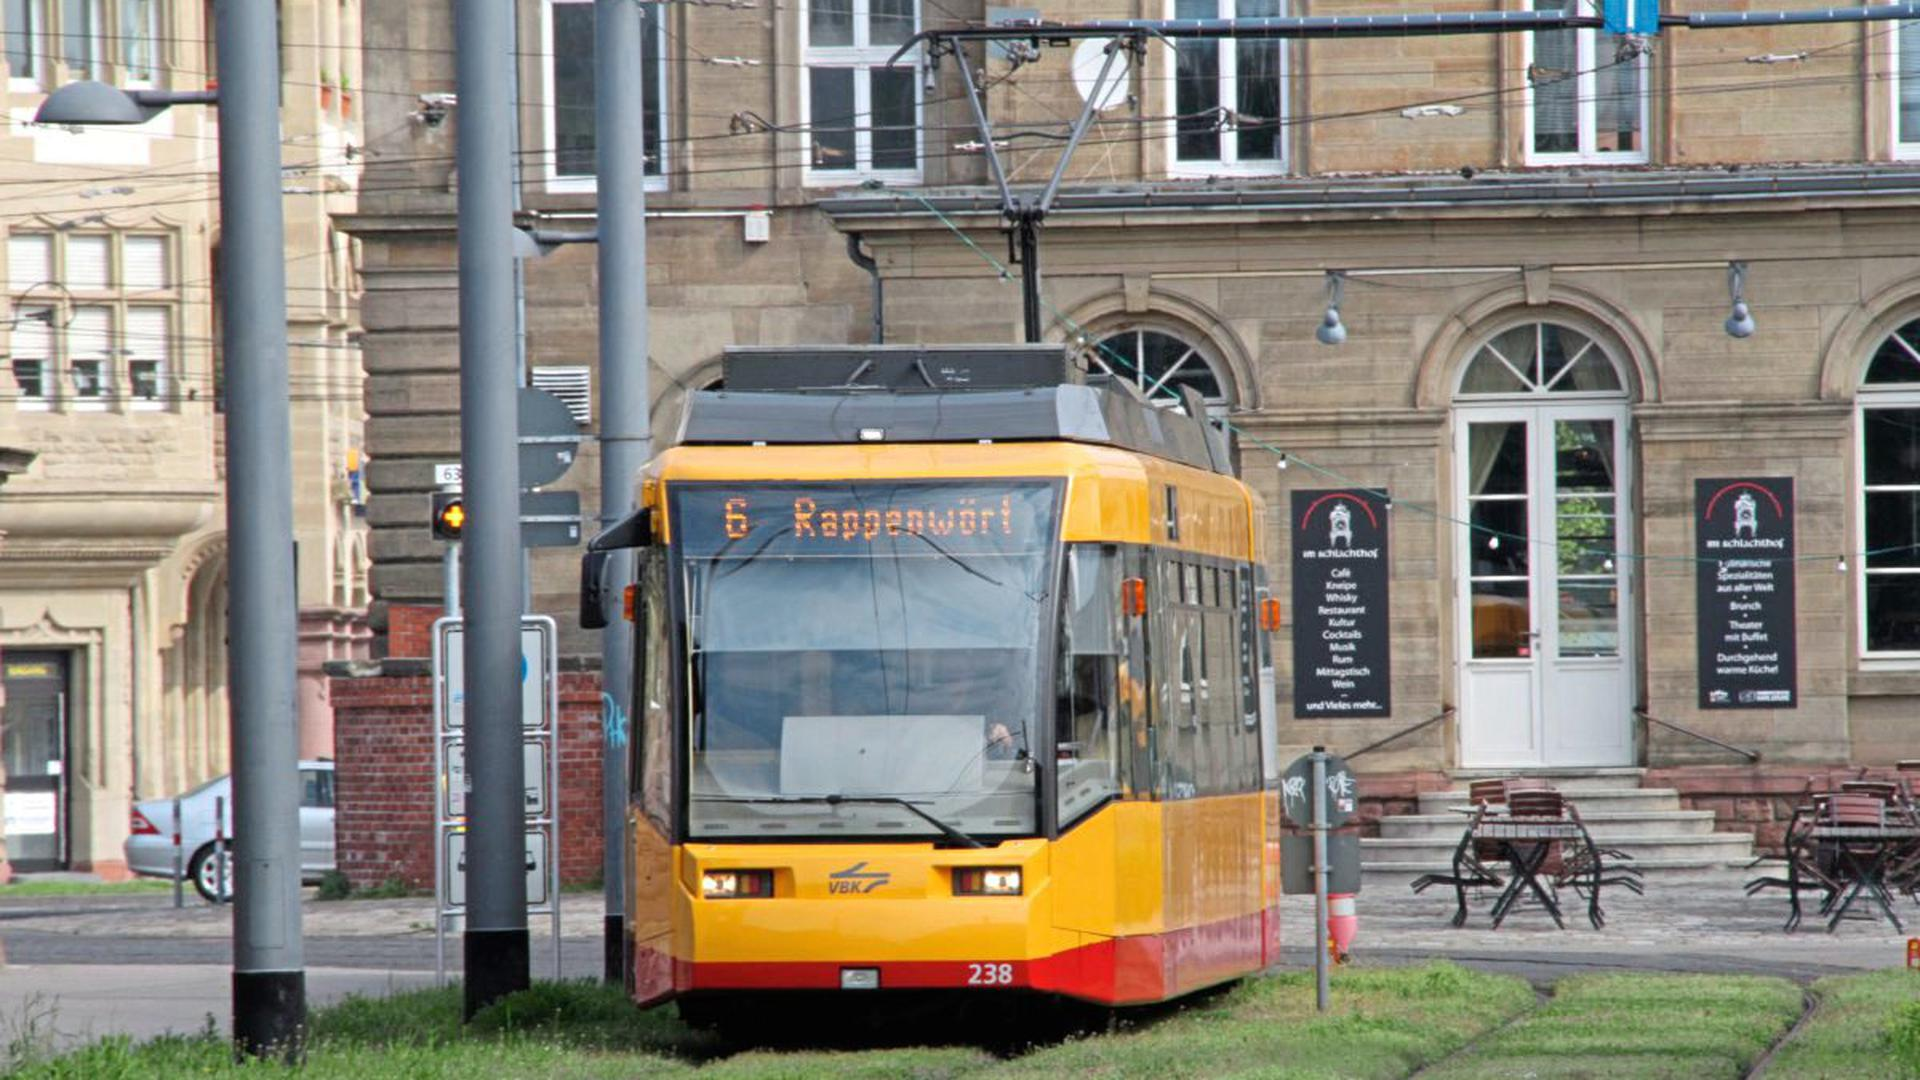 Straßenbahn 6 Rappenwört Karlsruhe